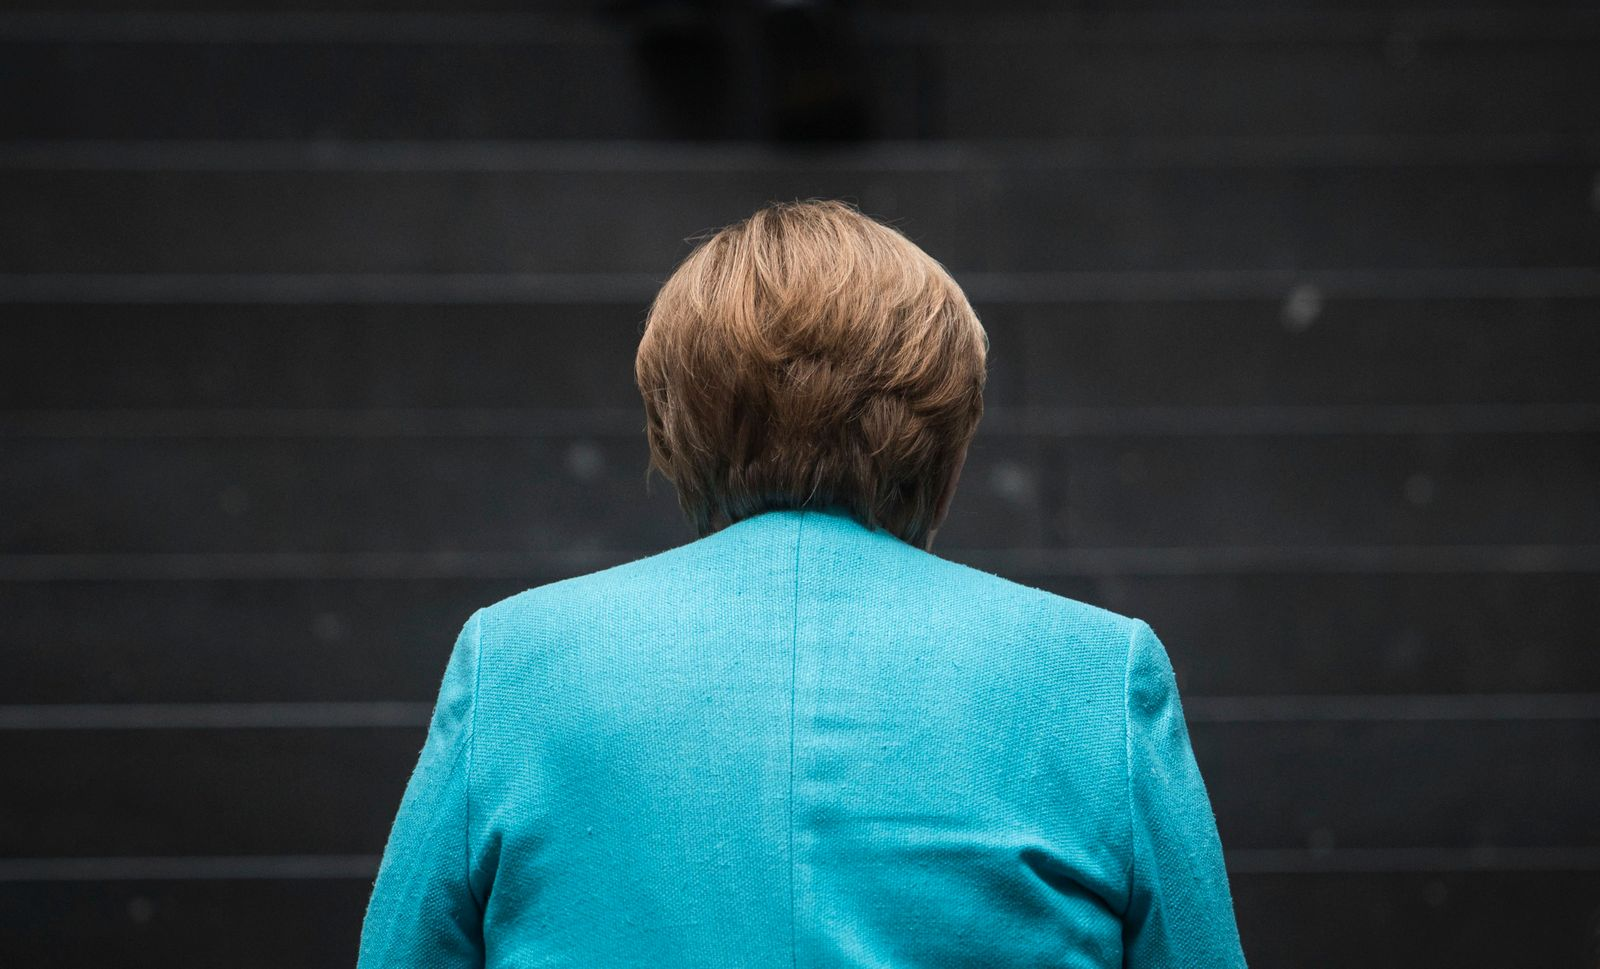 TOPSHOT-GERMANY-POLITICS-DIPLOMACY-MERKEL